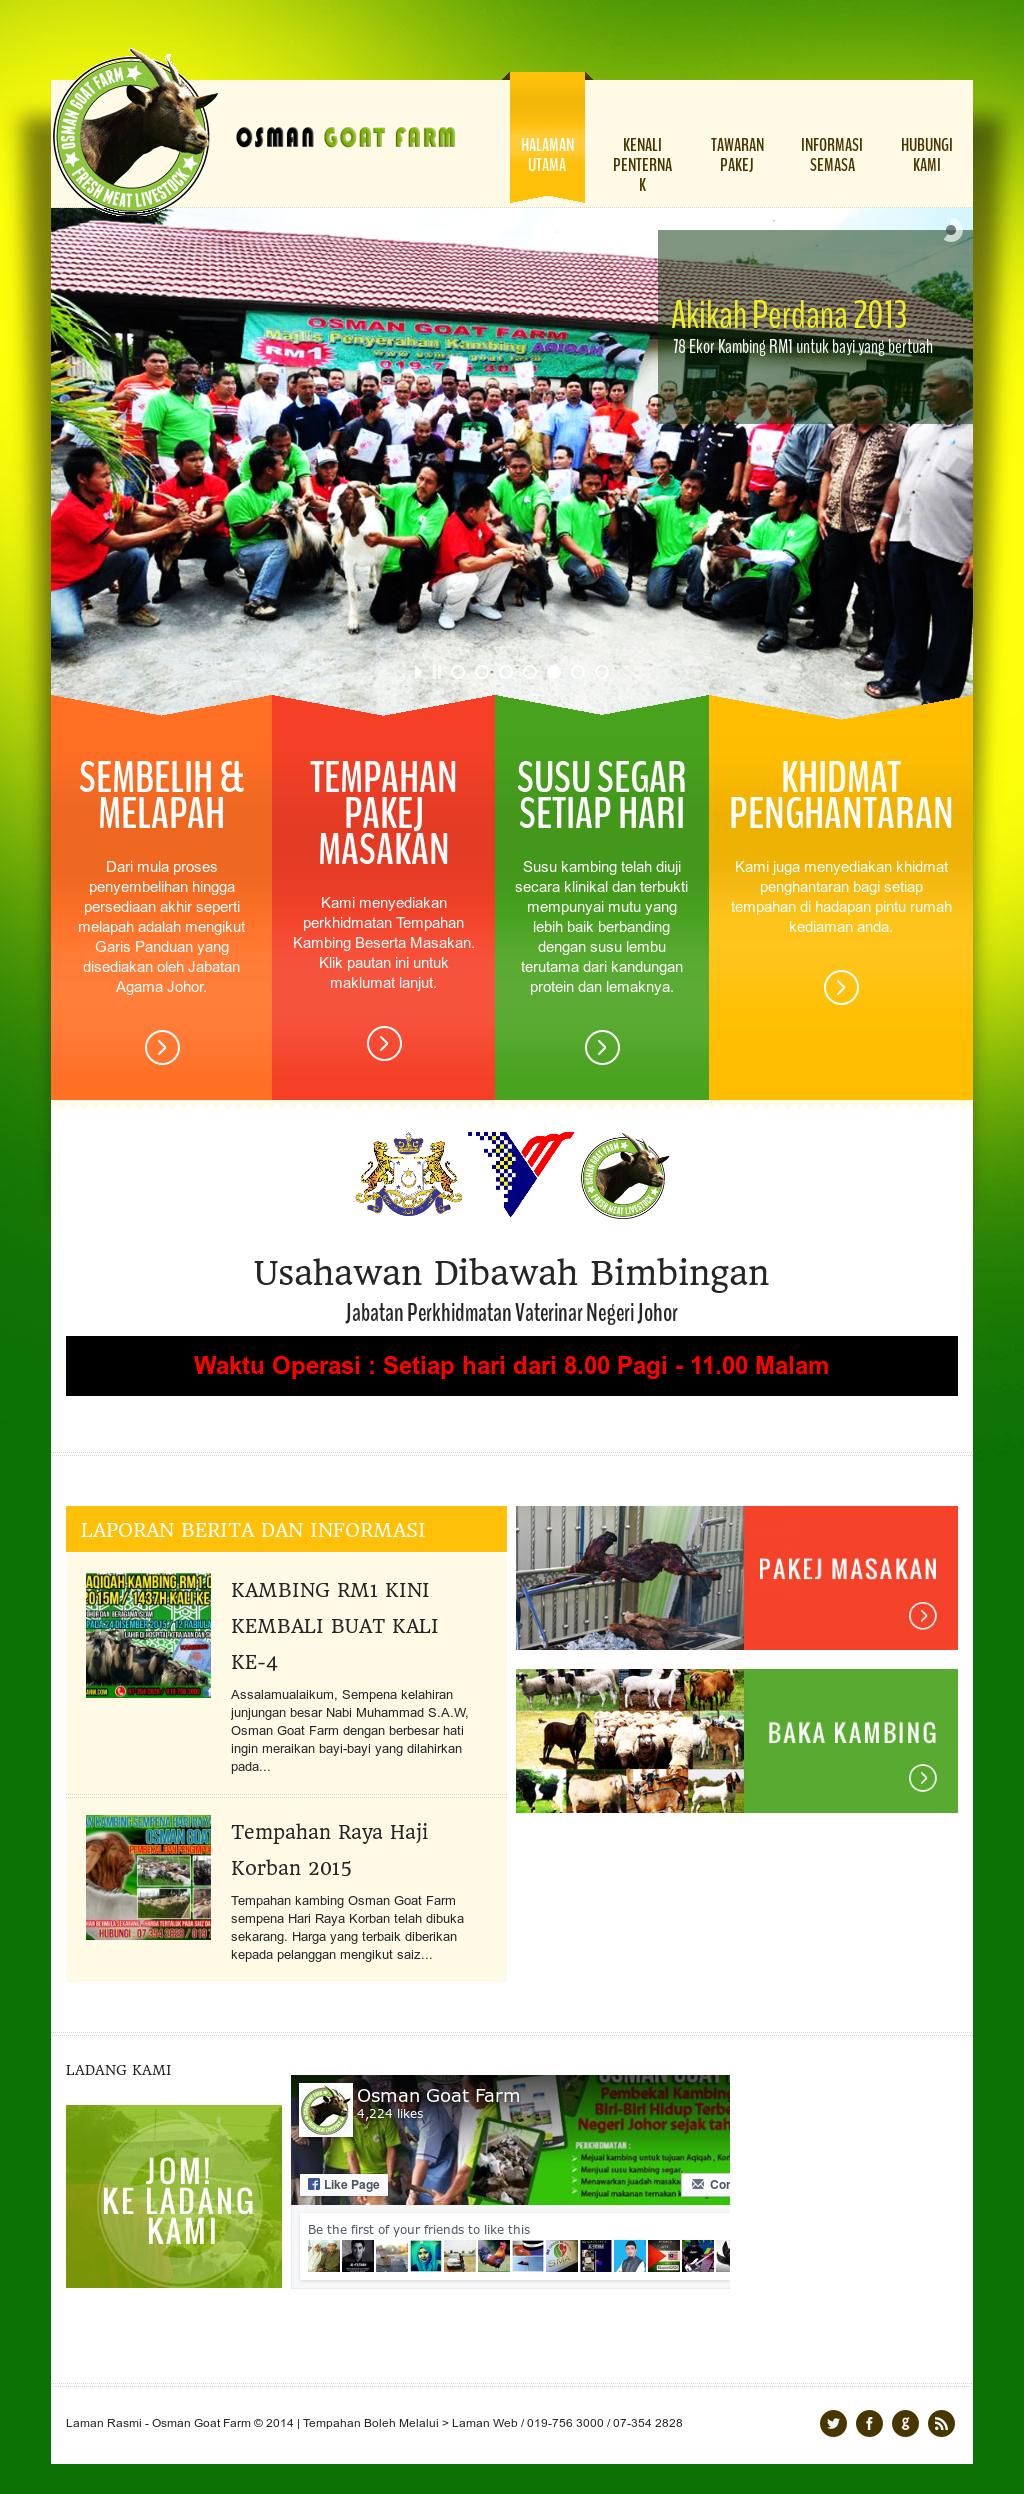 Osman Goat Farm Competitors, Revenue and Employees - Owler Company